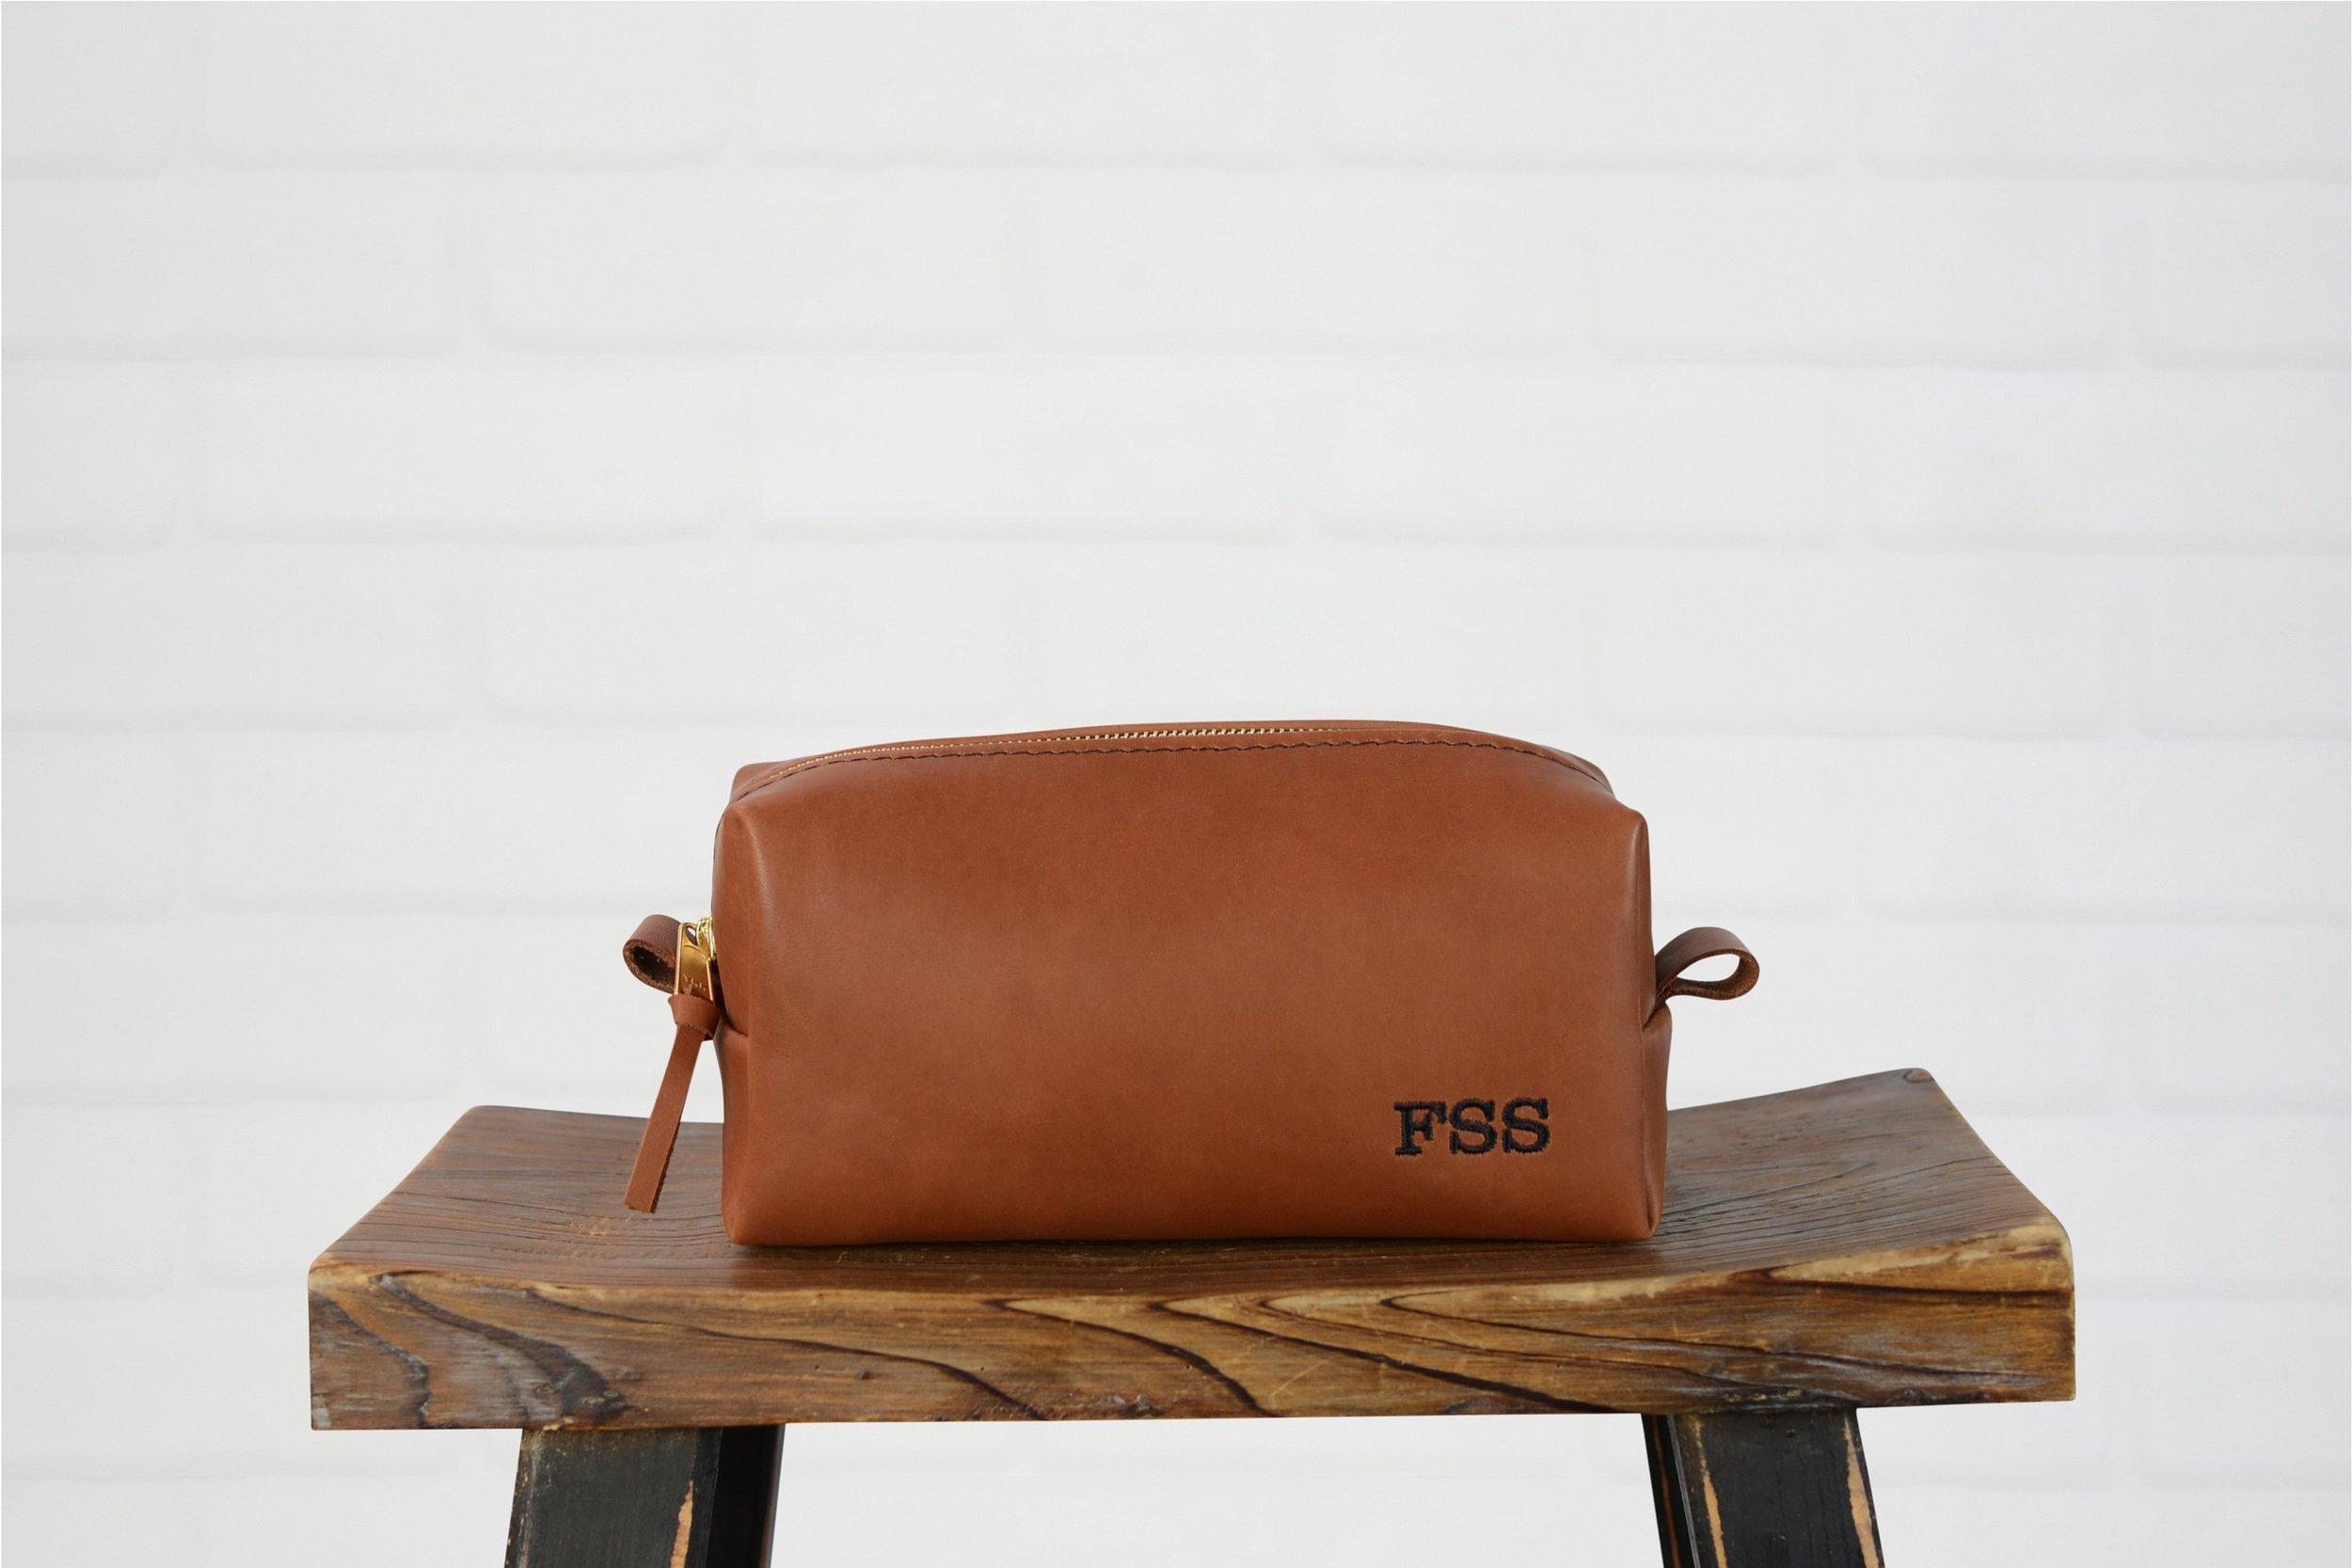 Felix Street Studios leather travel bag